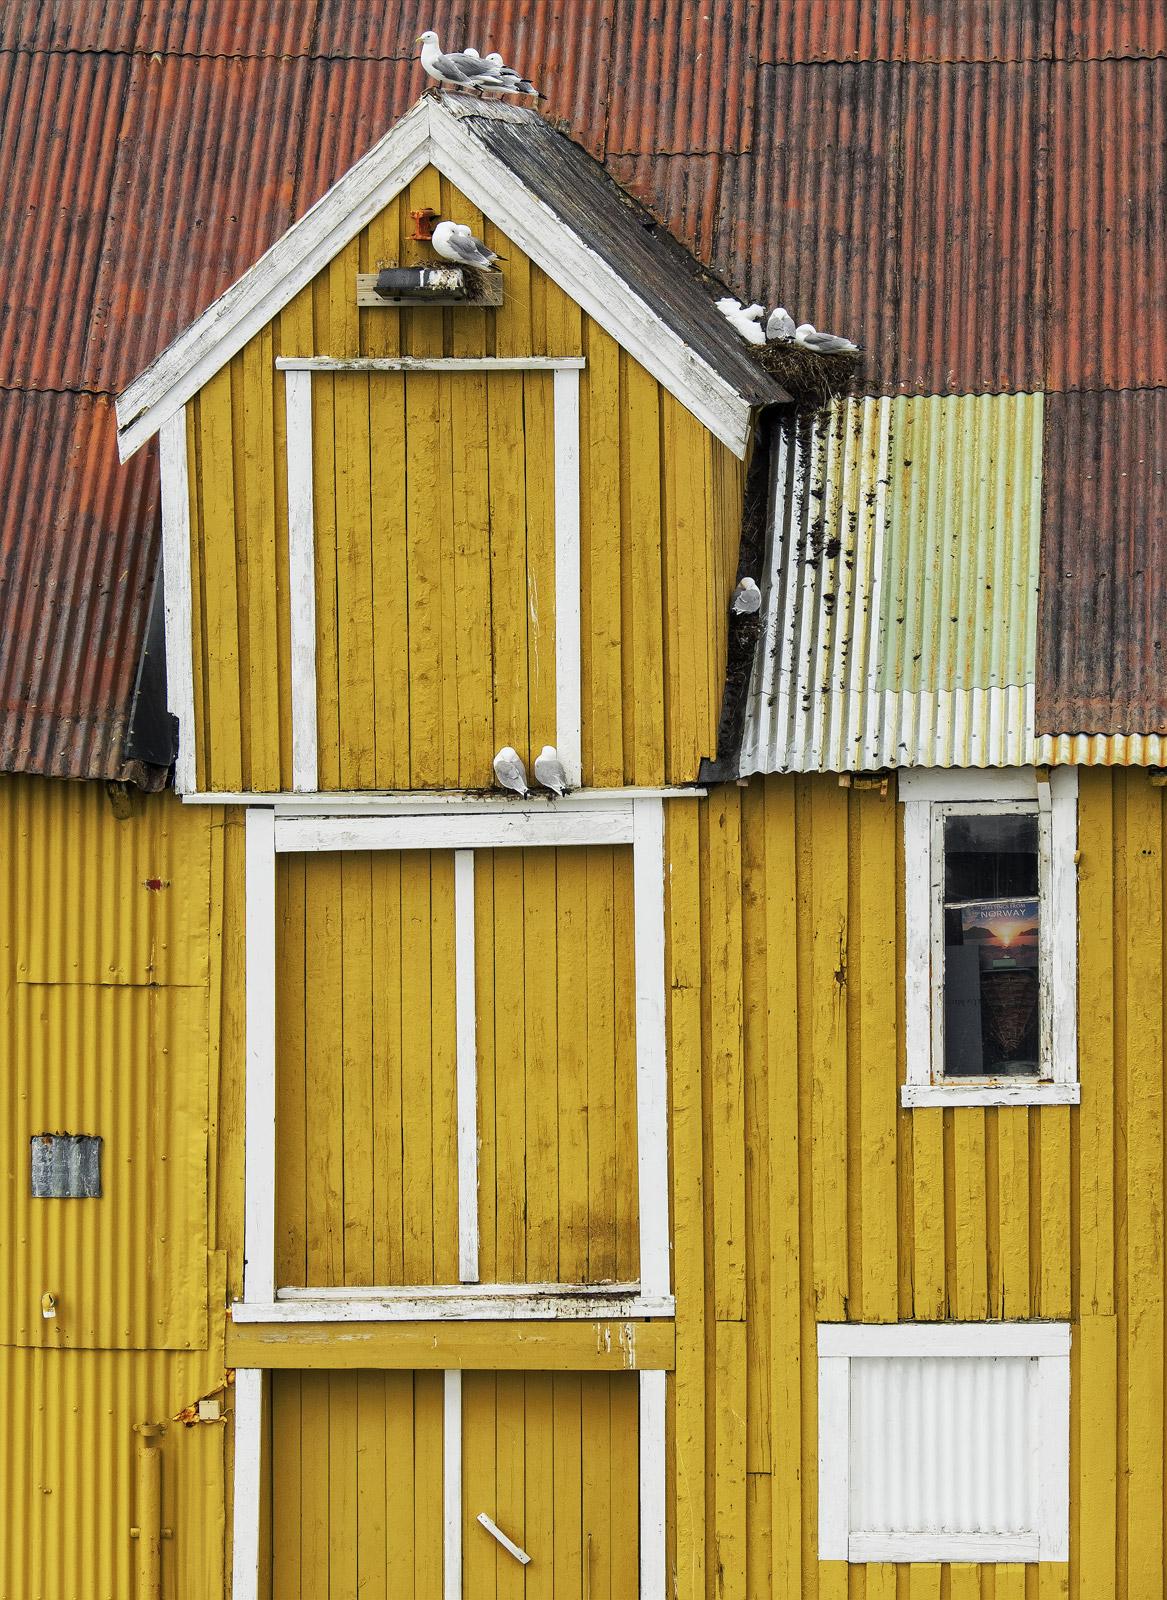 Nusfjord kittiwake, Nusfjord, Lofoten, Norway,coloured, houses, rorbrua, harbour, nest, seagull, refuge, nook, cranny , photo